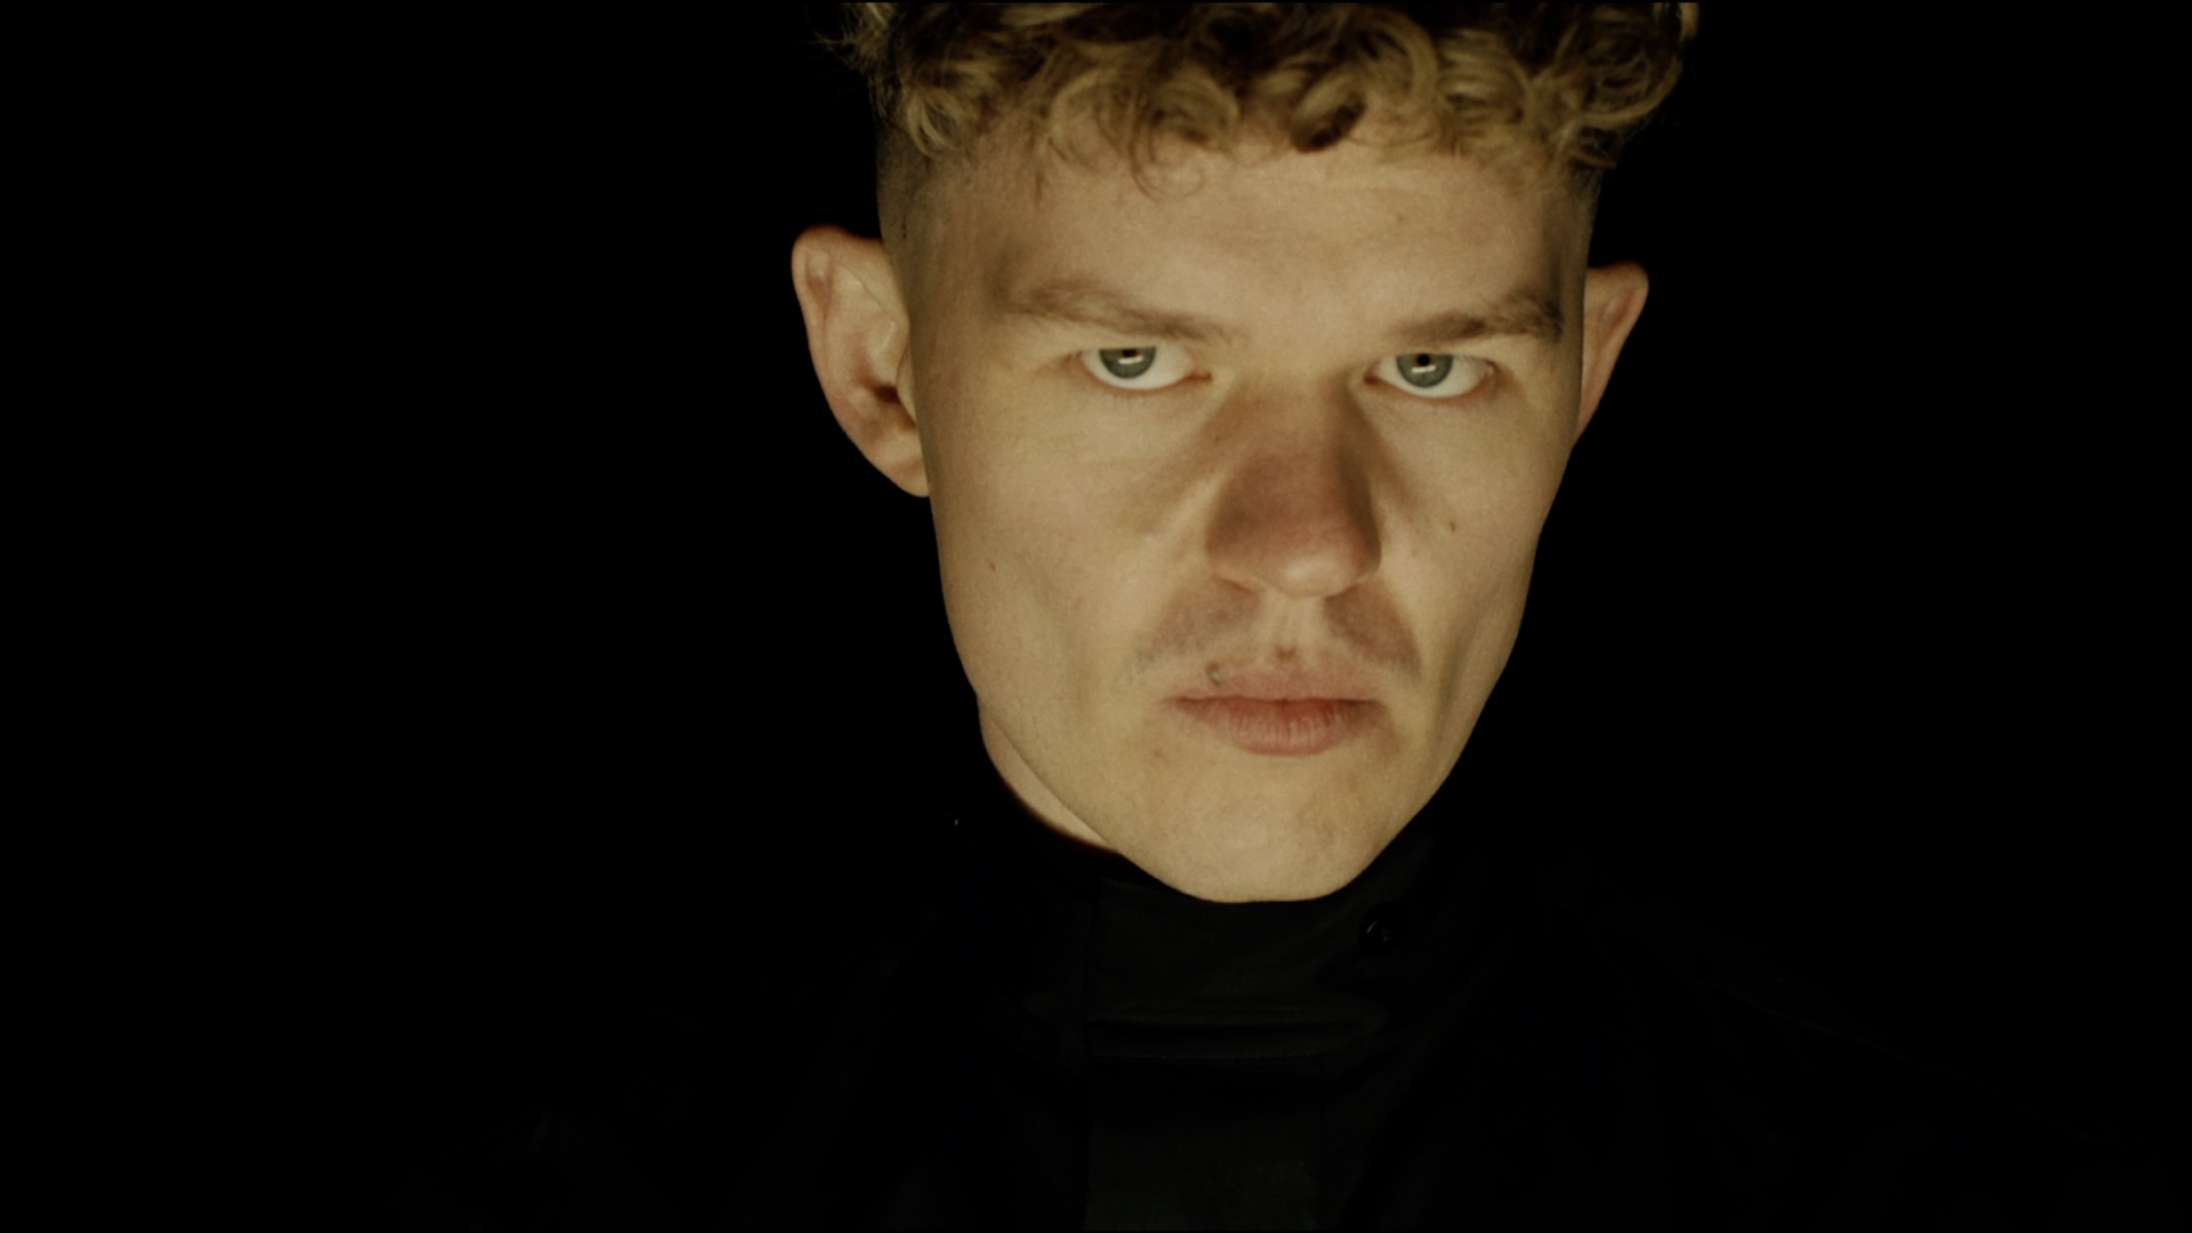 Saveus møder 'Marco Effekten' i den dramatiske musikvideo til titelsangen 'Traitors'